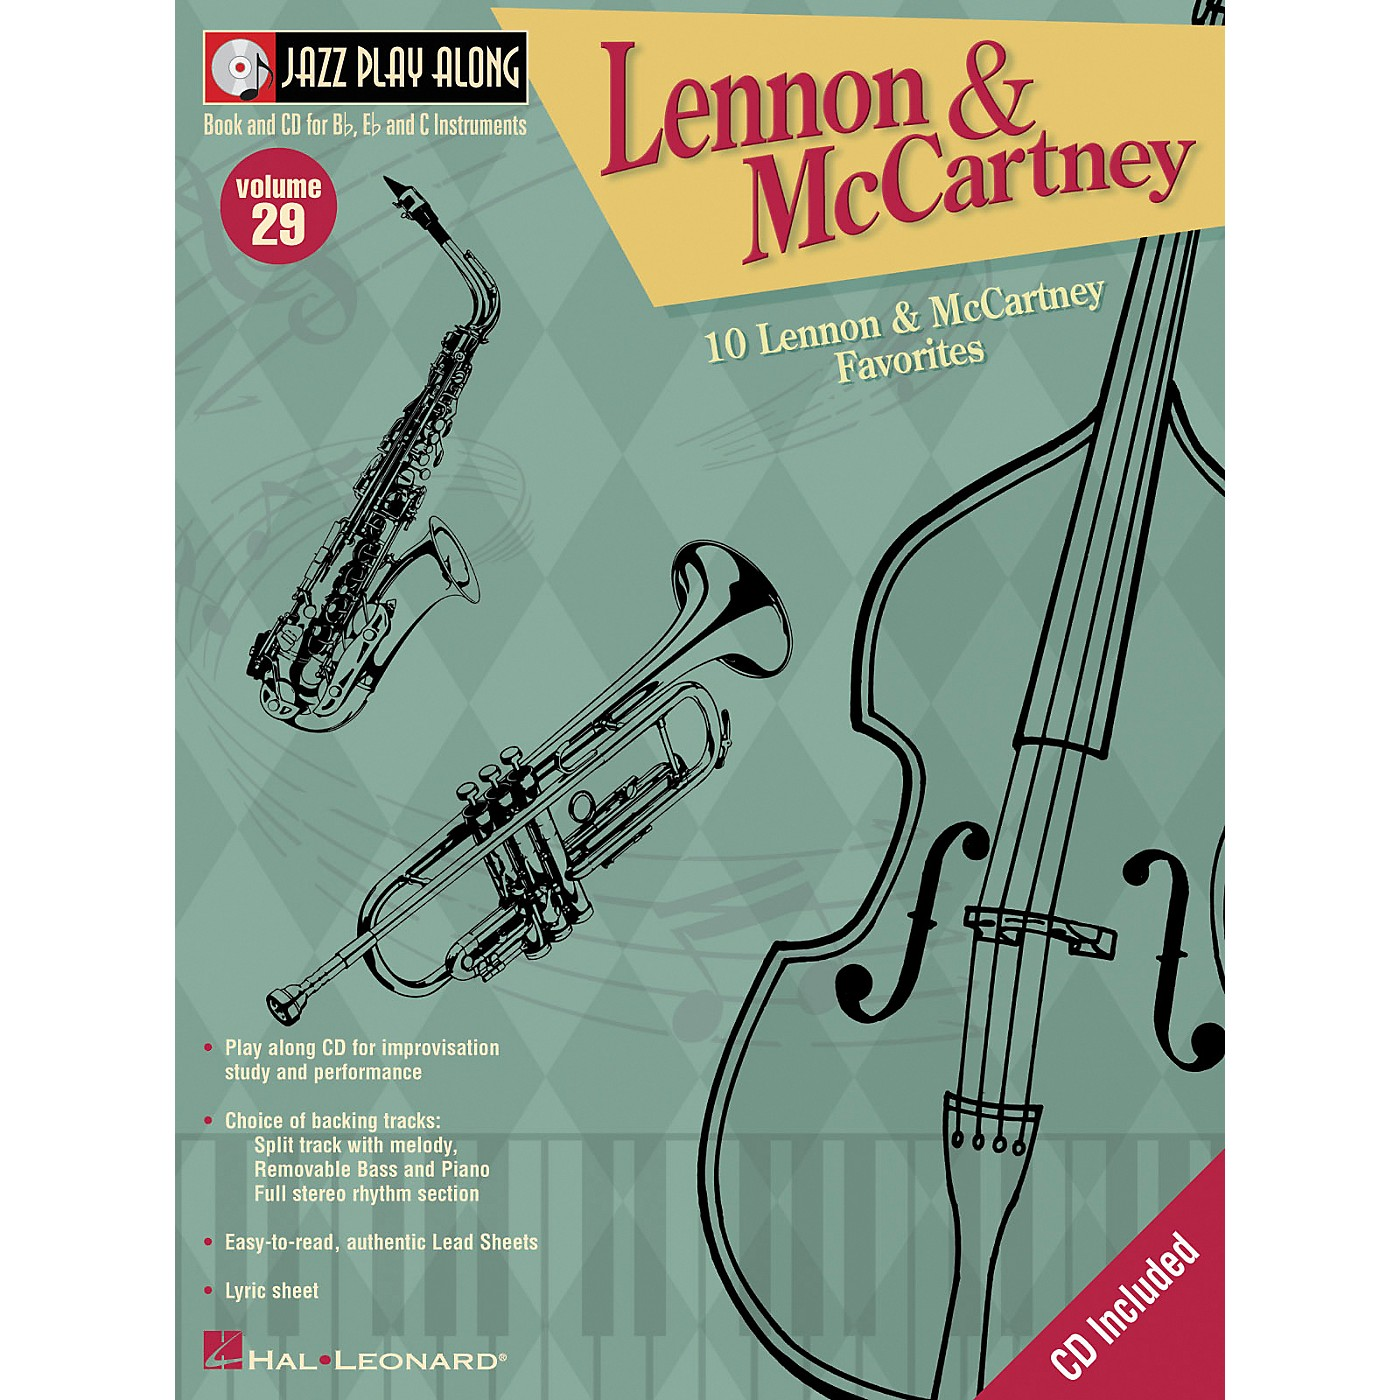 Hal Leonard Lennon And McCartney - Jazz Play Along Volume 29 Book with CD thumbnail